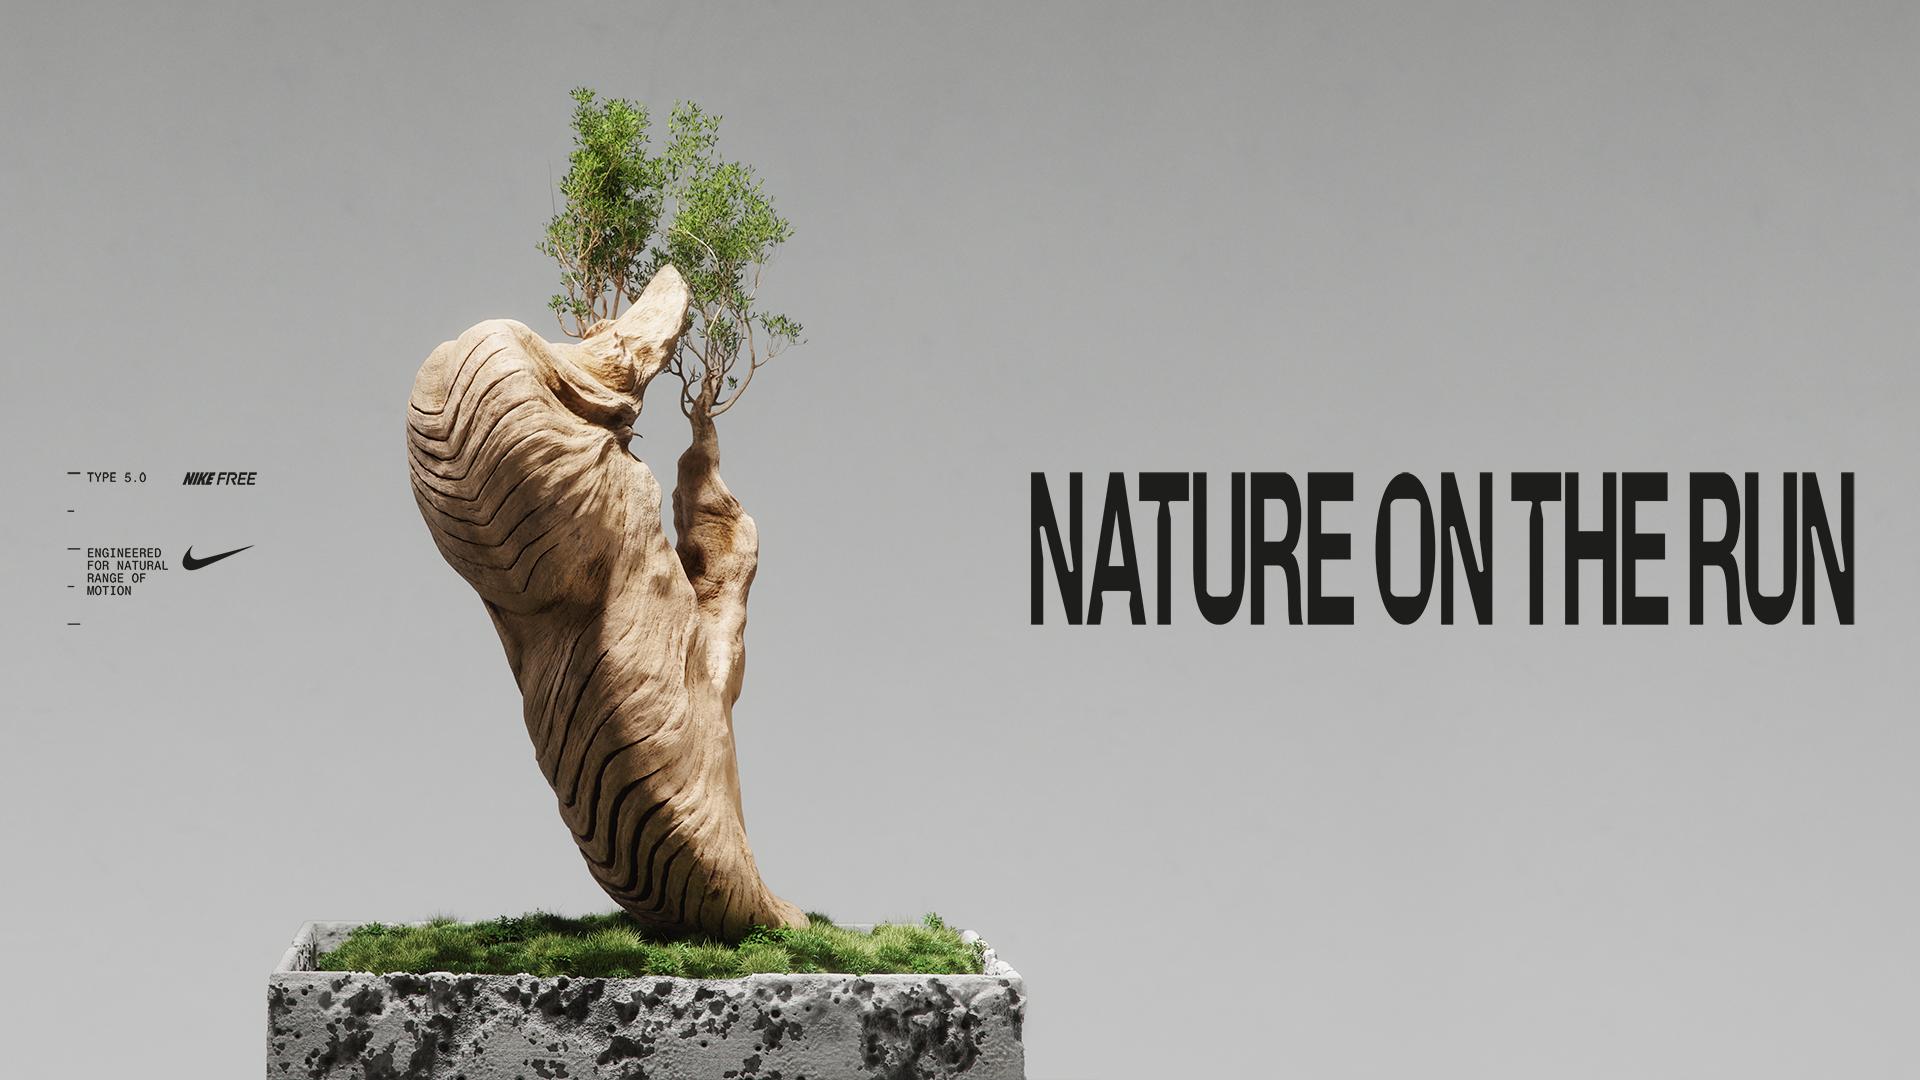 Nike_Free_Foot_5k_Comp_Natureontherun.png